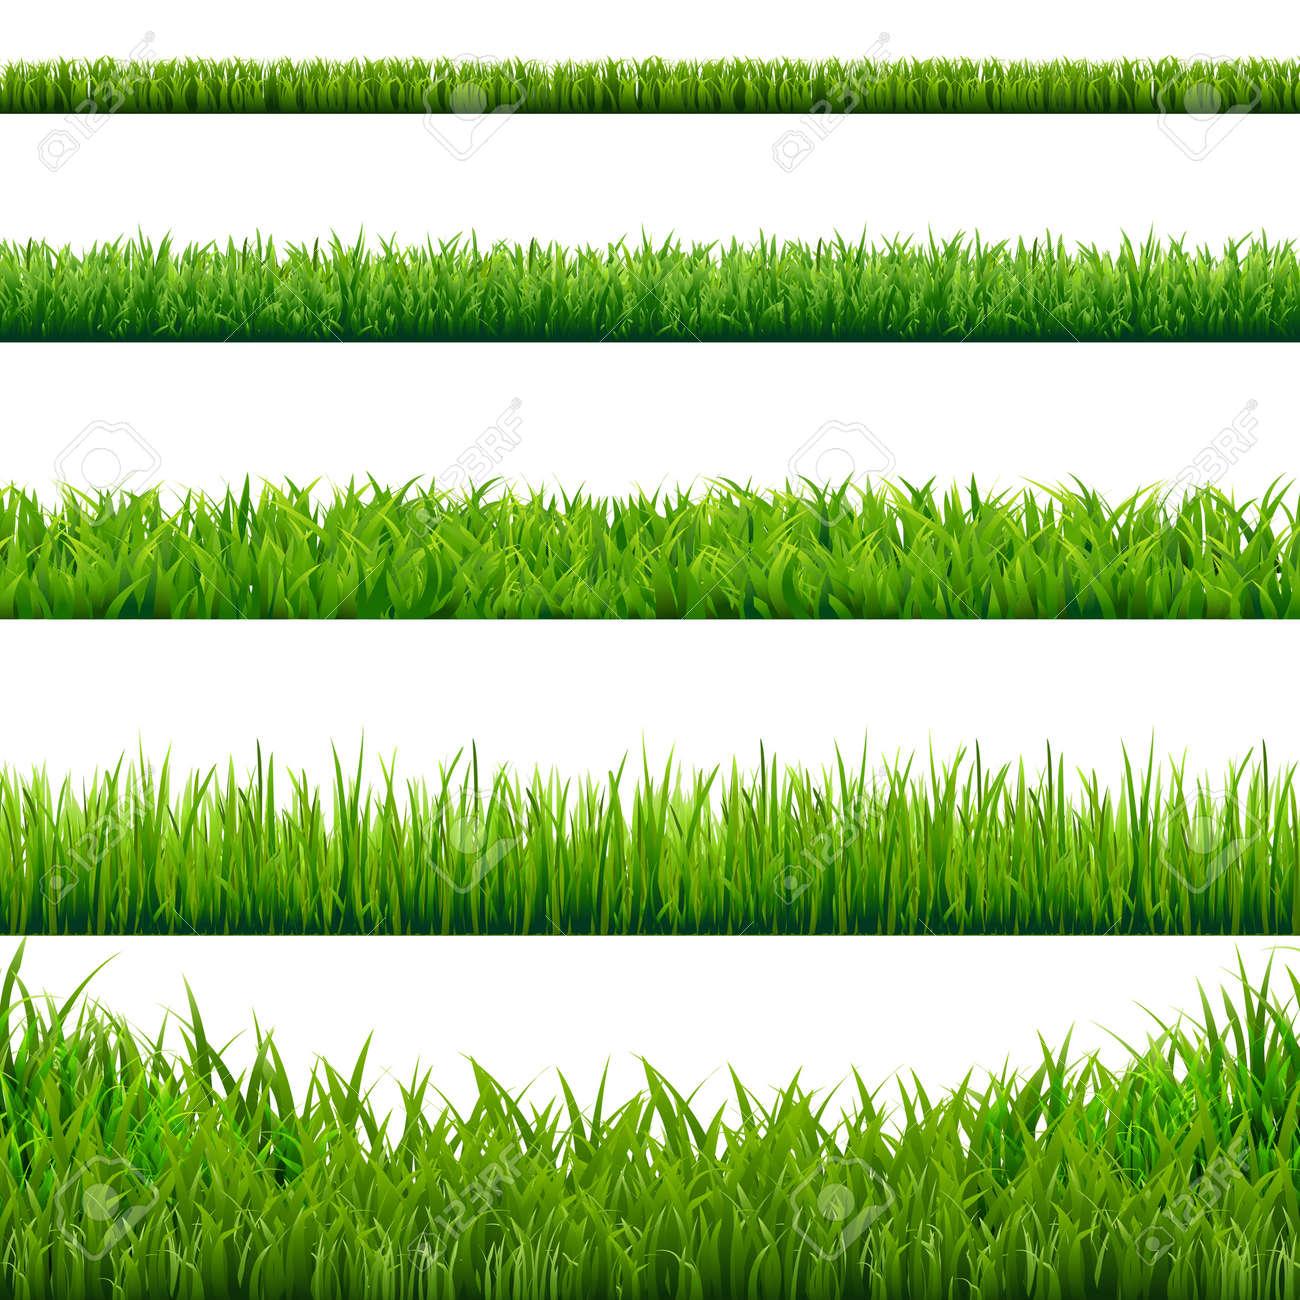 Big Grass Borders Set, Vector Illustration - 51631852